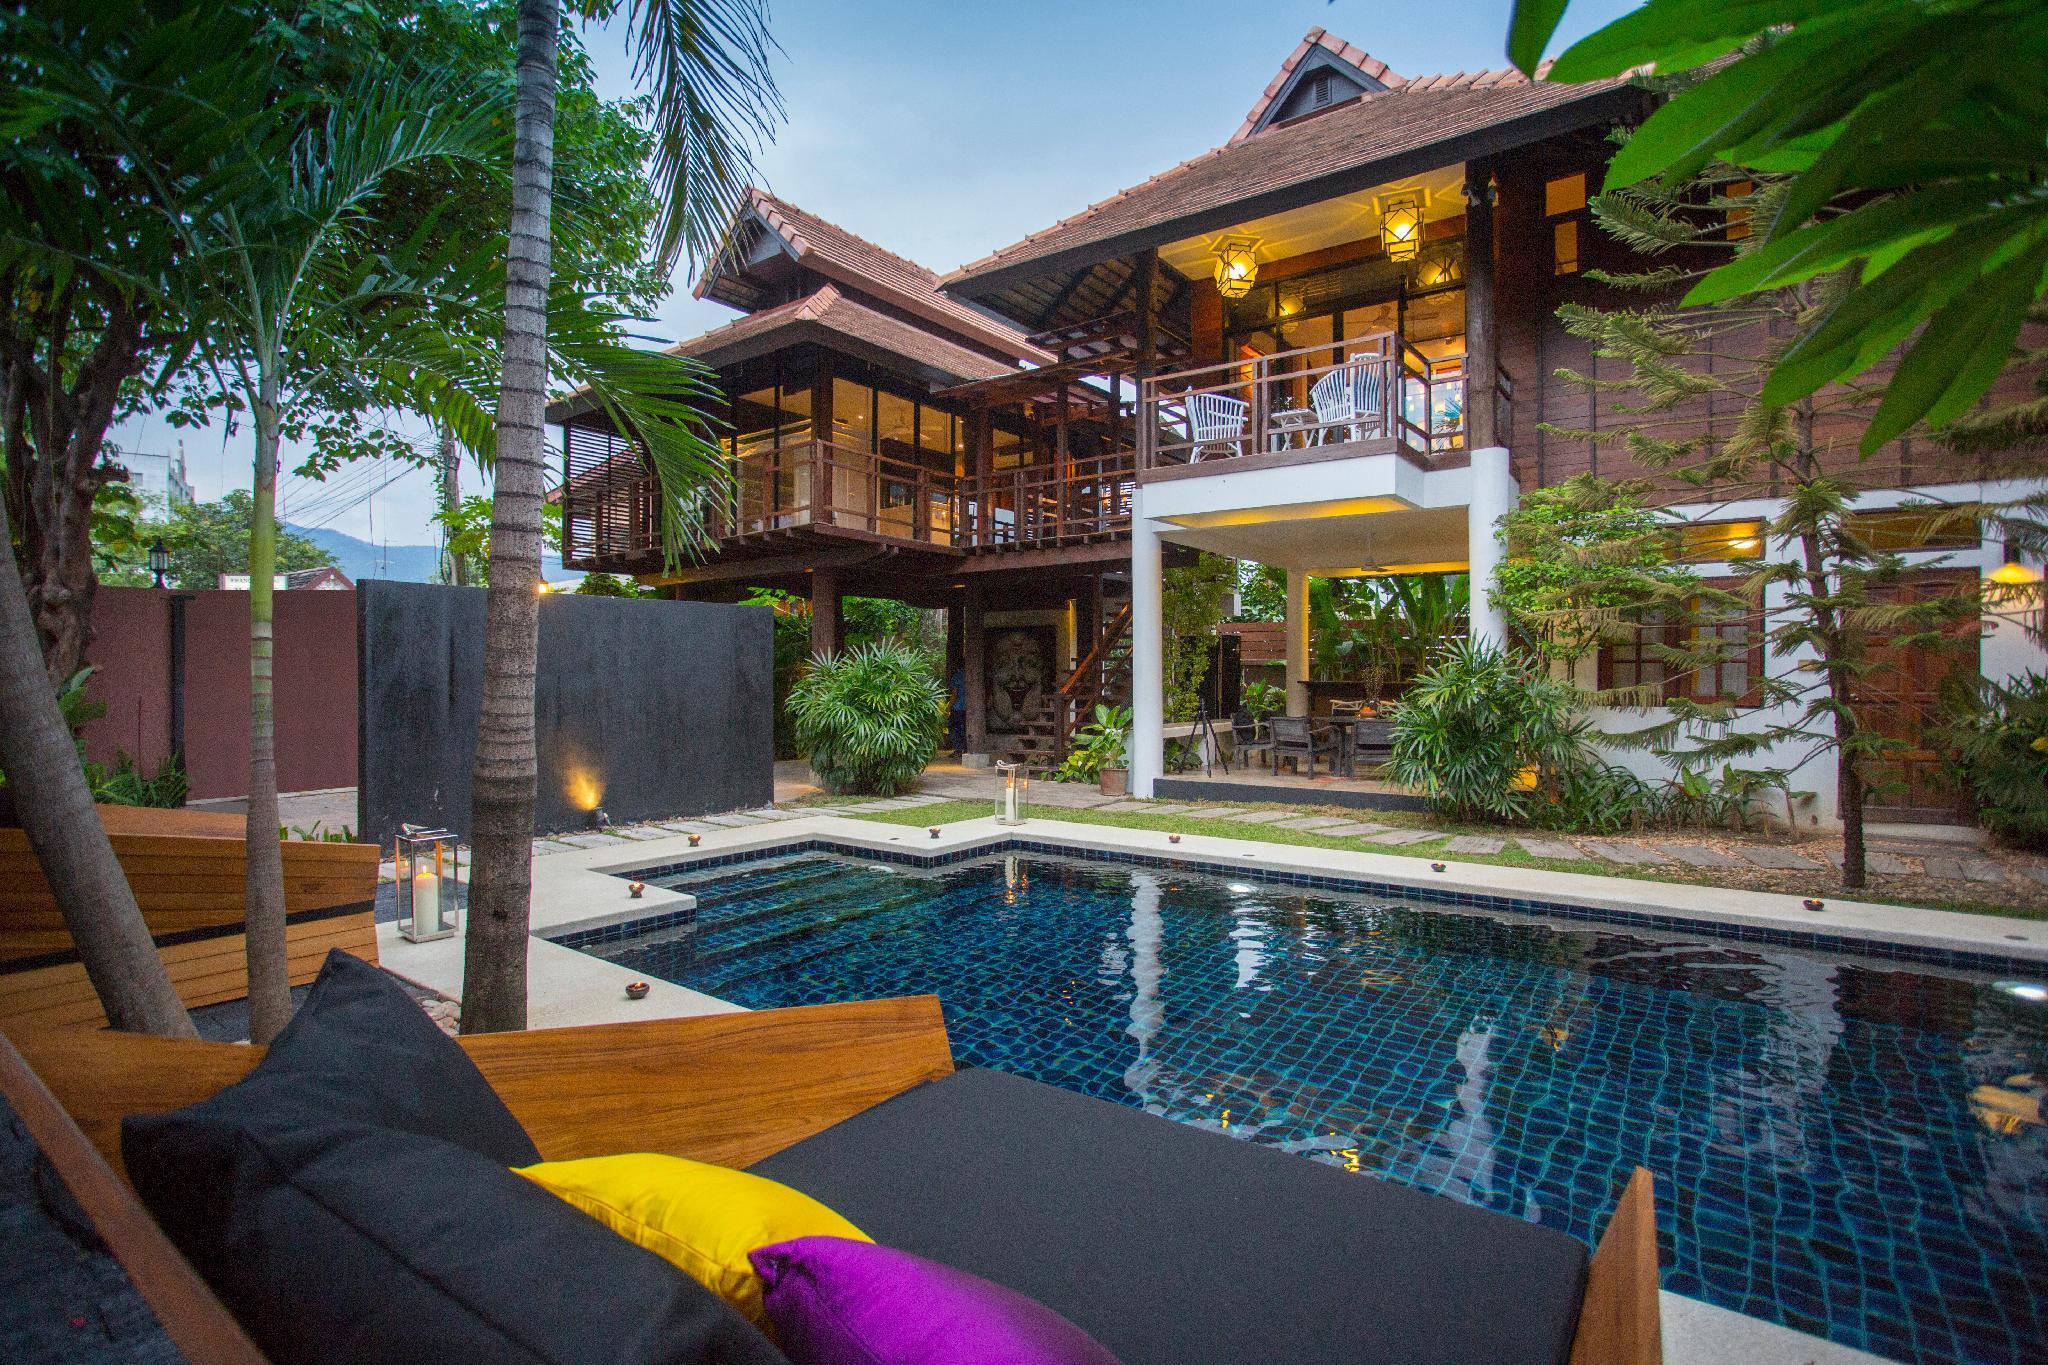 X2 Chiang Mai North Gate Villa,ครอสทู เชียงใหม่ นอร์ธ เกท วิลล่า